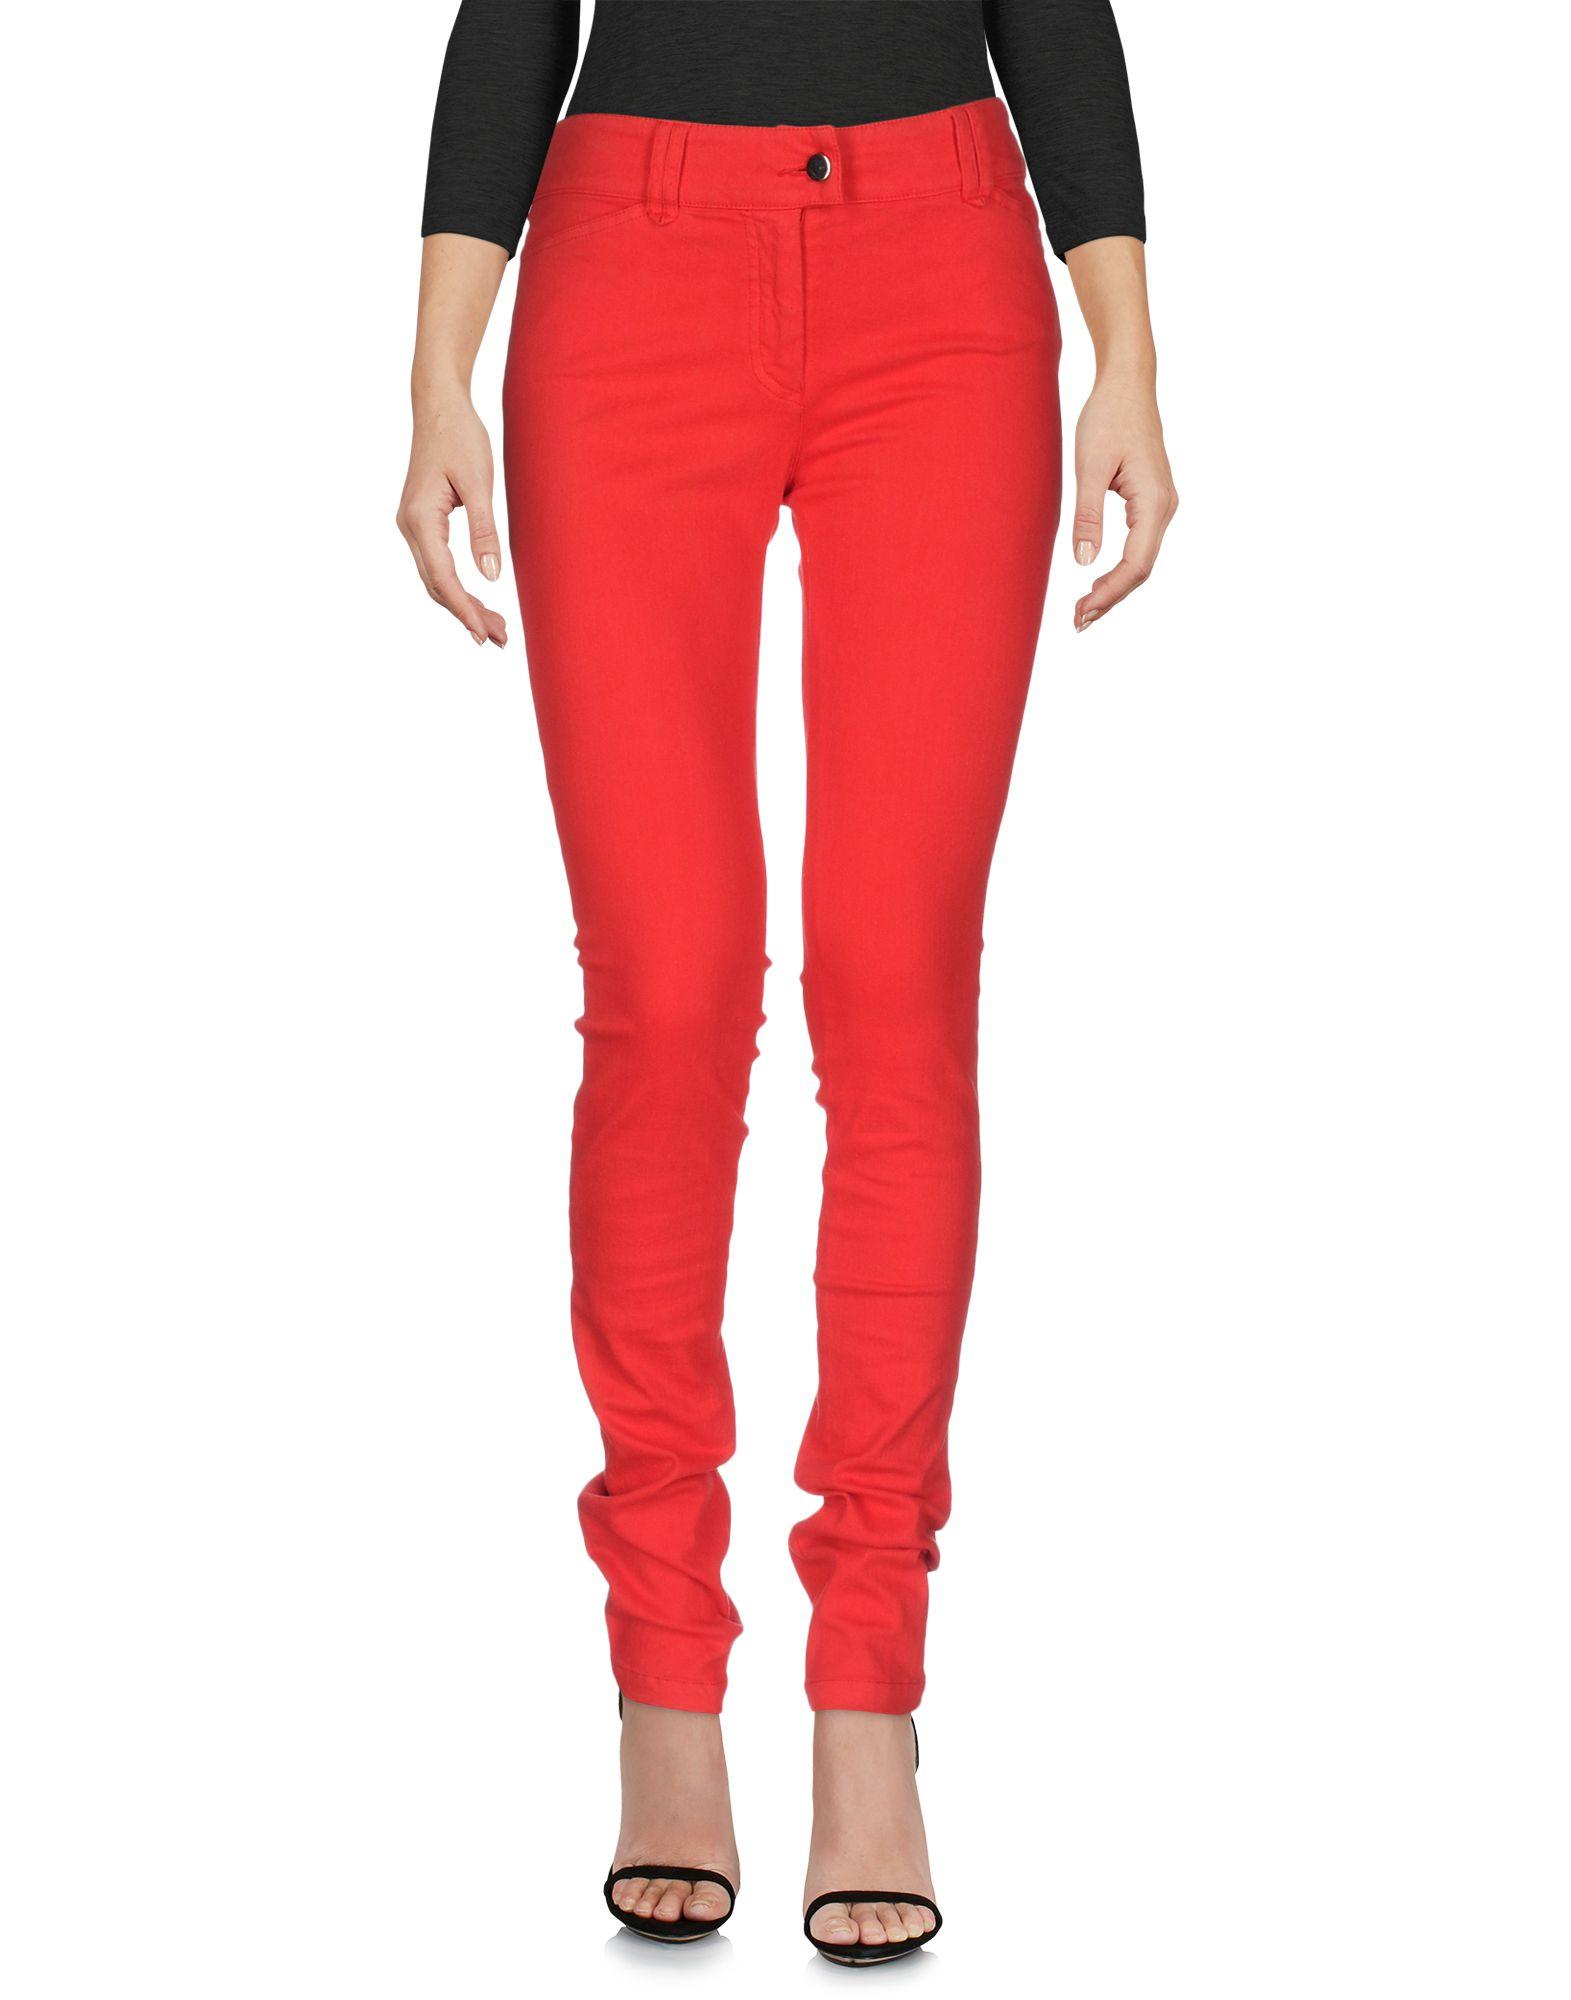 BALENCIAGA Damen Jeanshose Farbe Rot Größe 4